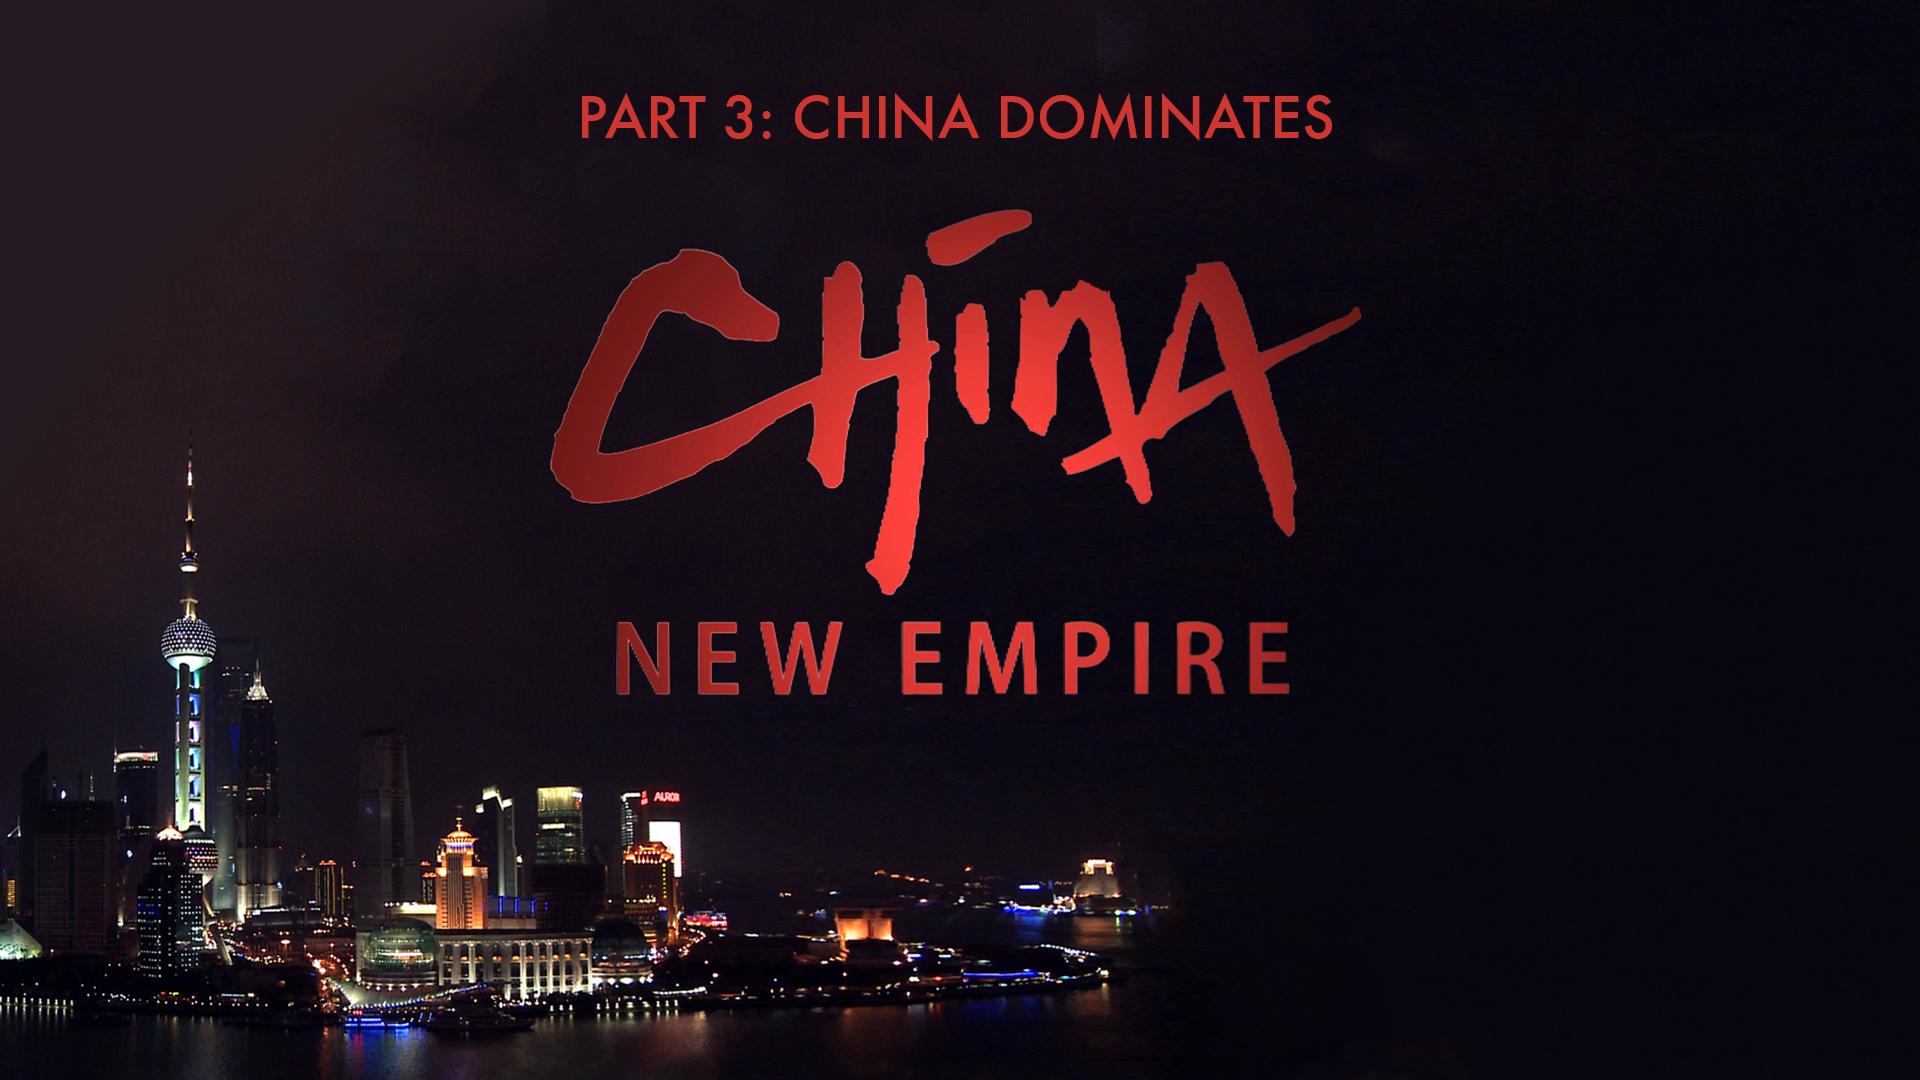 China New Empire - Part 3: China Dominates